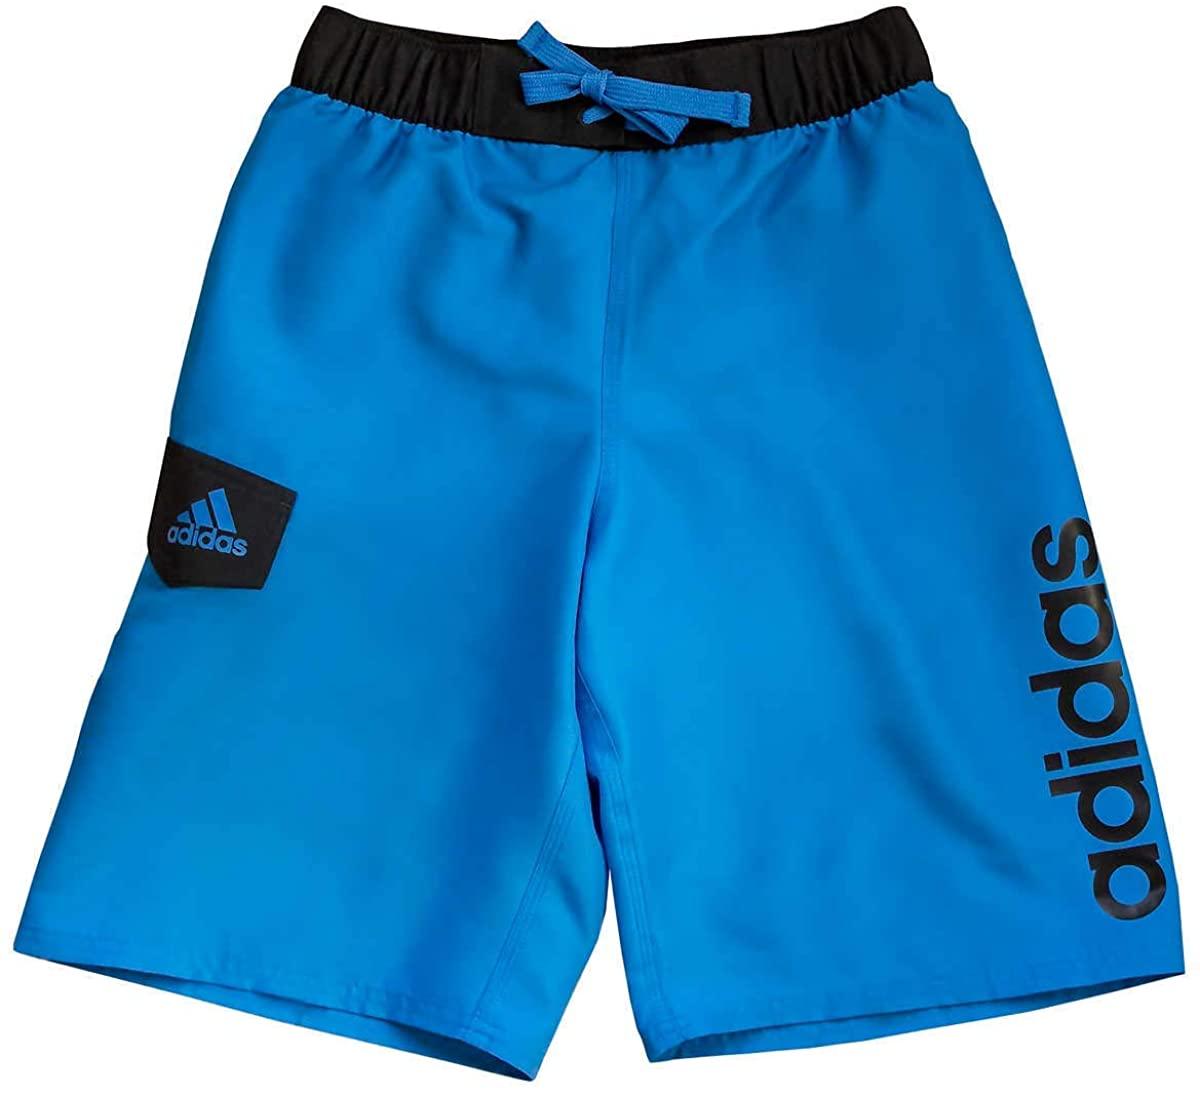 adidas Boys Swim Trunks Boardshorts